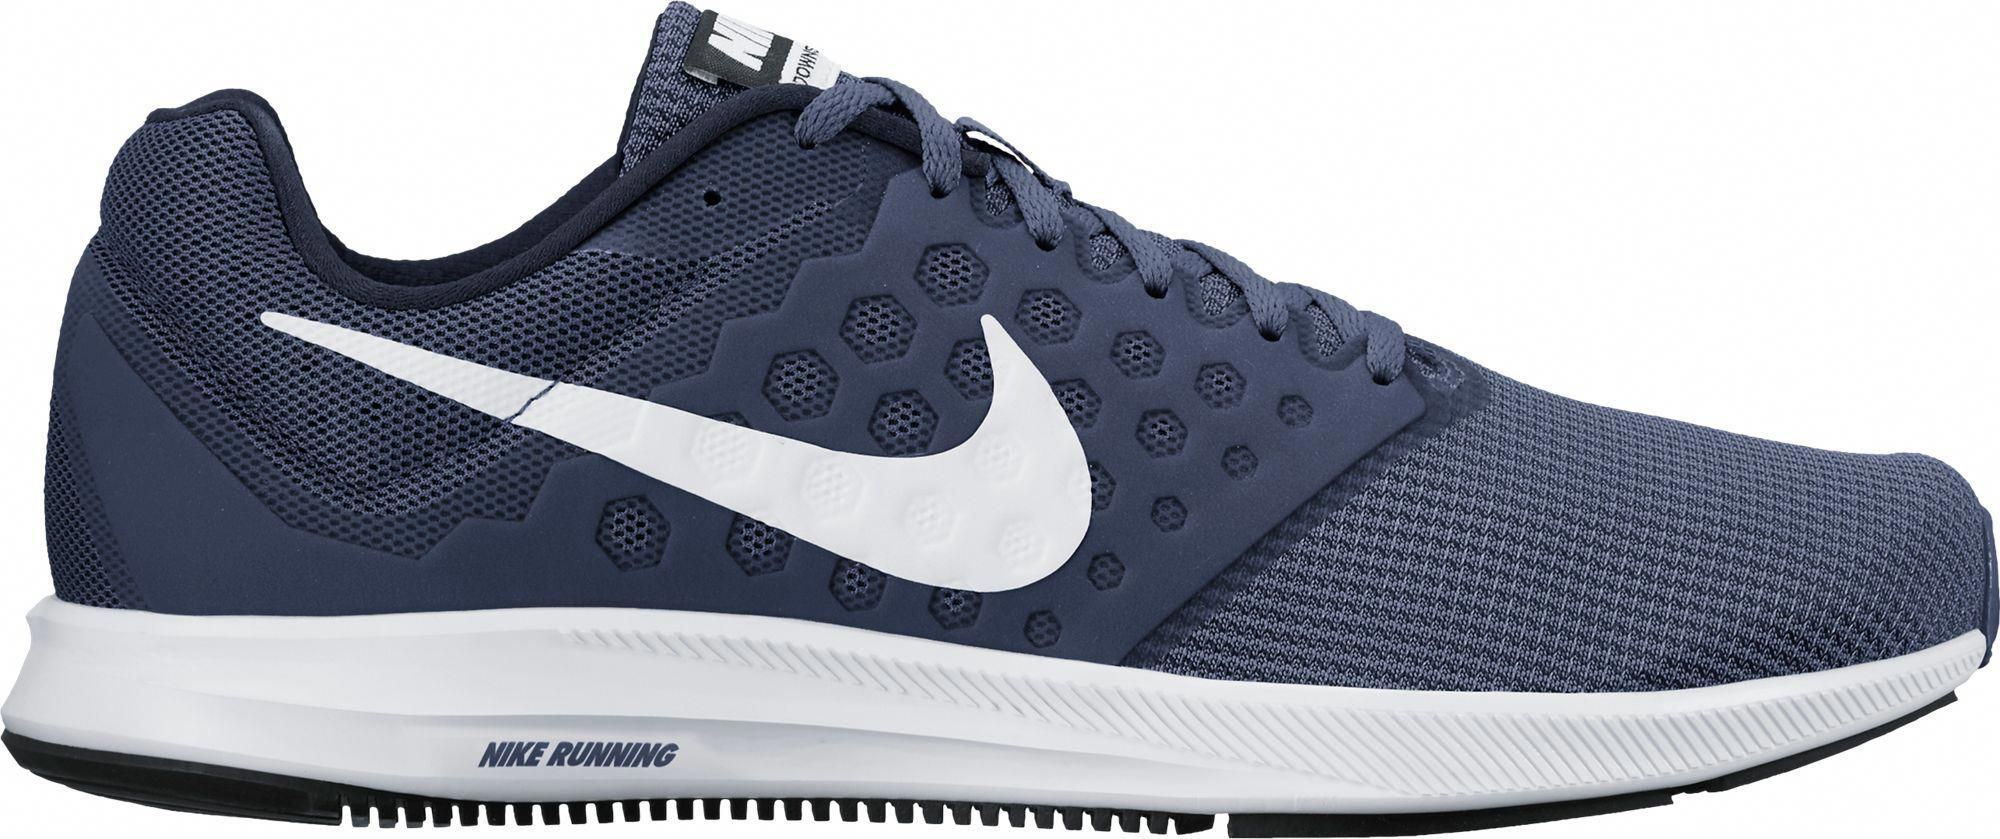 0998aec6bb6f5 Nike Men s Downshifter 7 Running Shoes